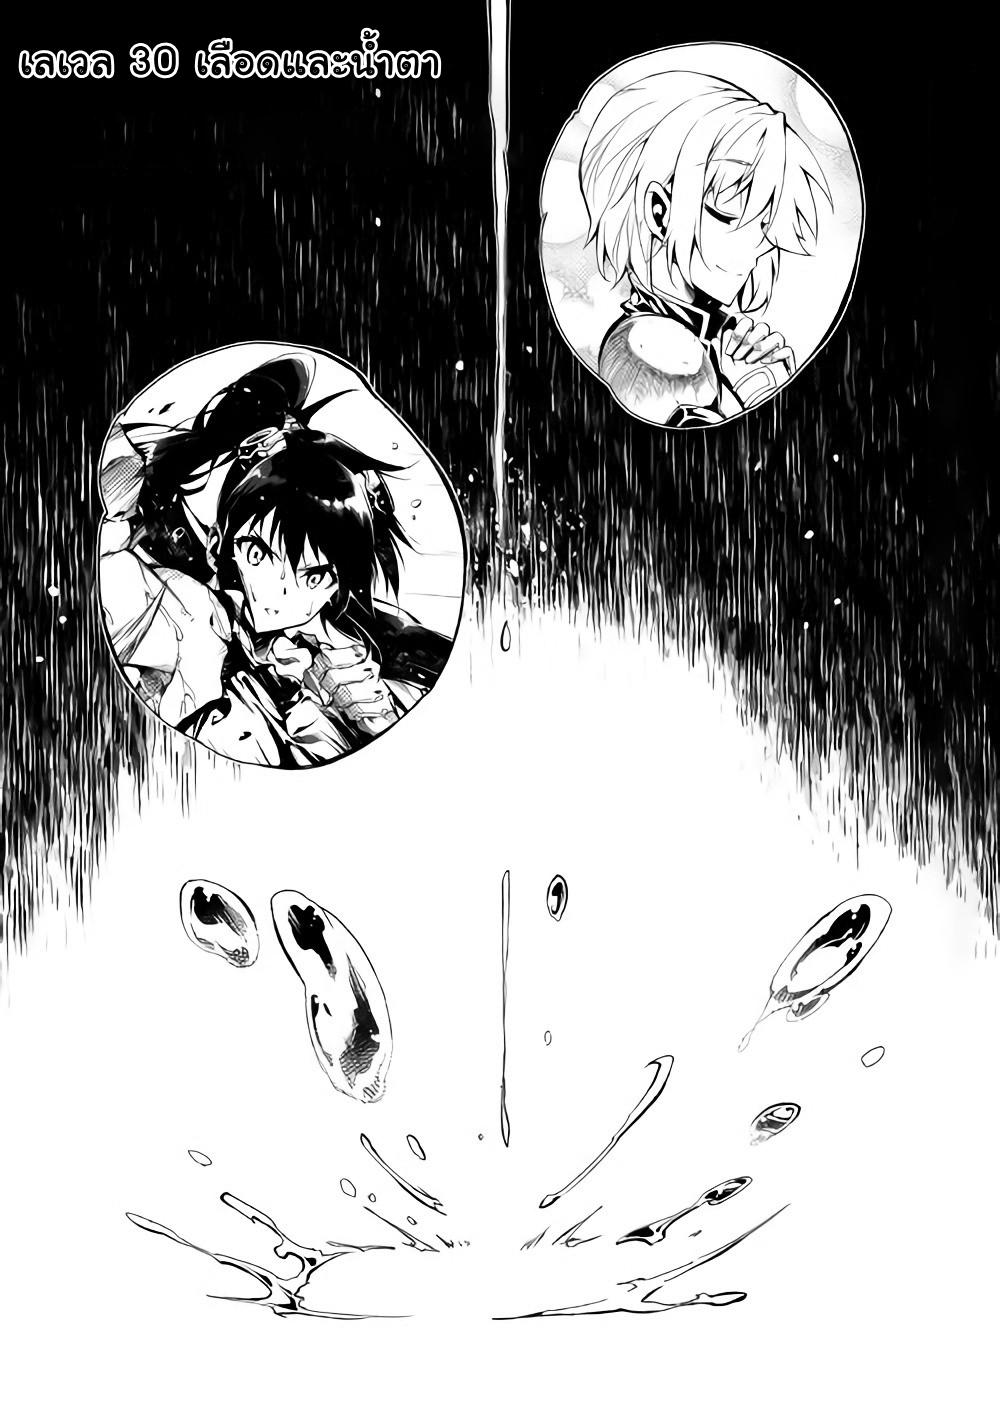 Kouritsu Kuriya Madoushi, Dani no Jinsei de Madou o Kiwameru ตอนที่ 30 เลือดและน้ำตา